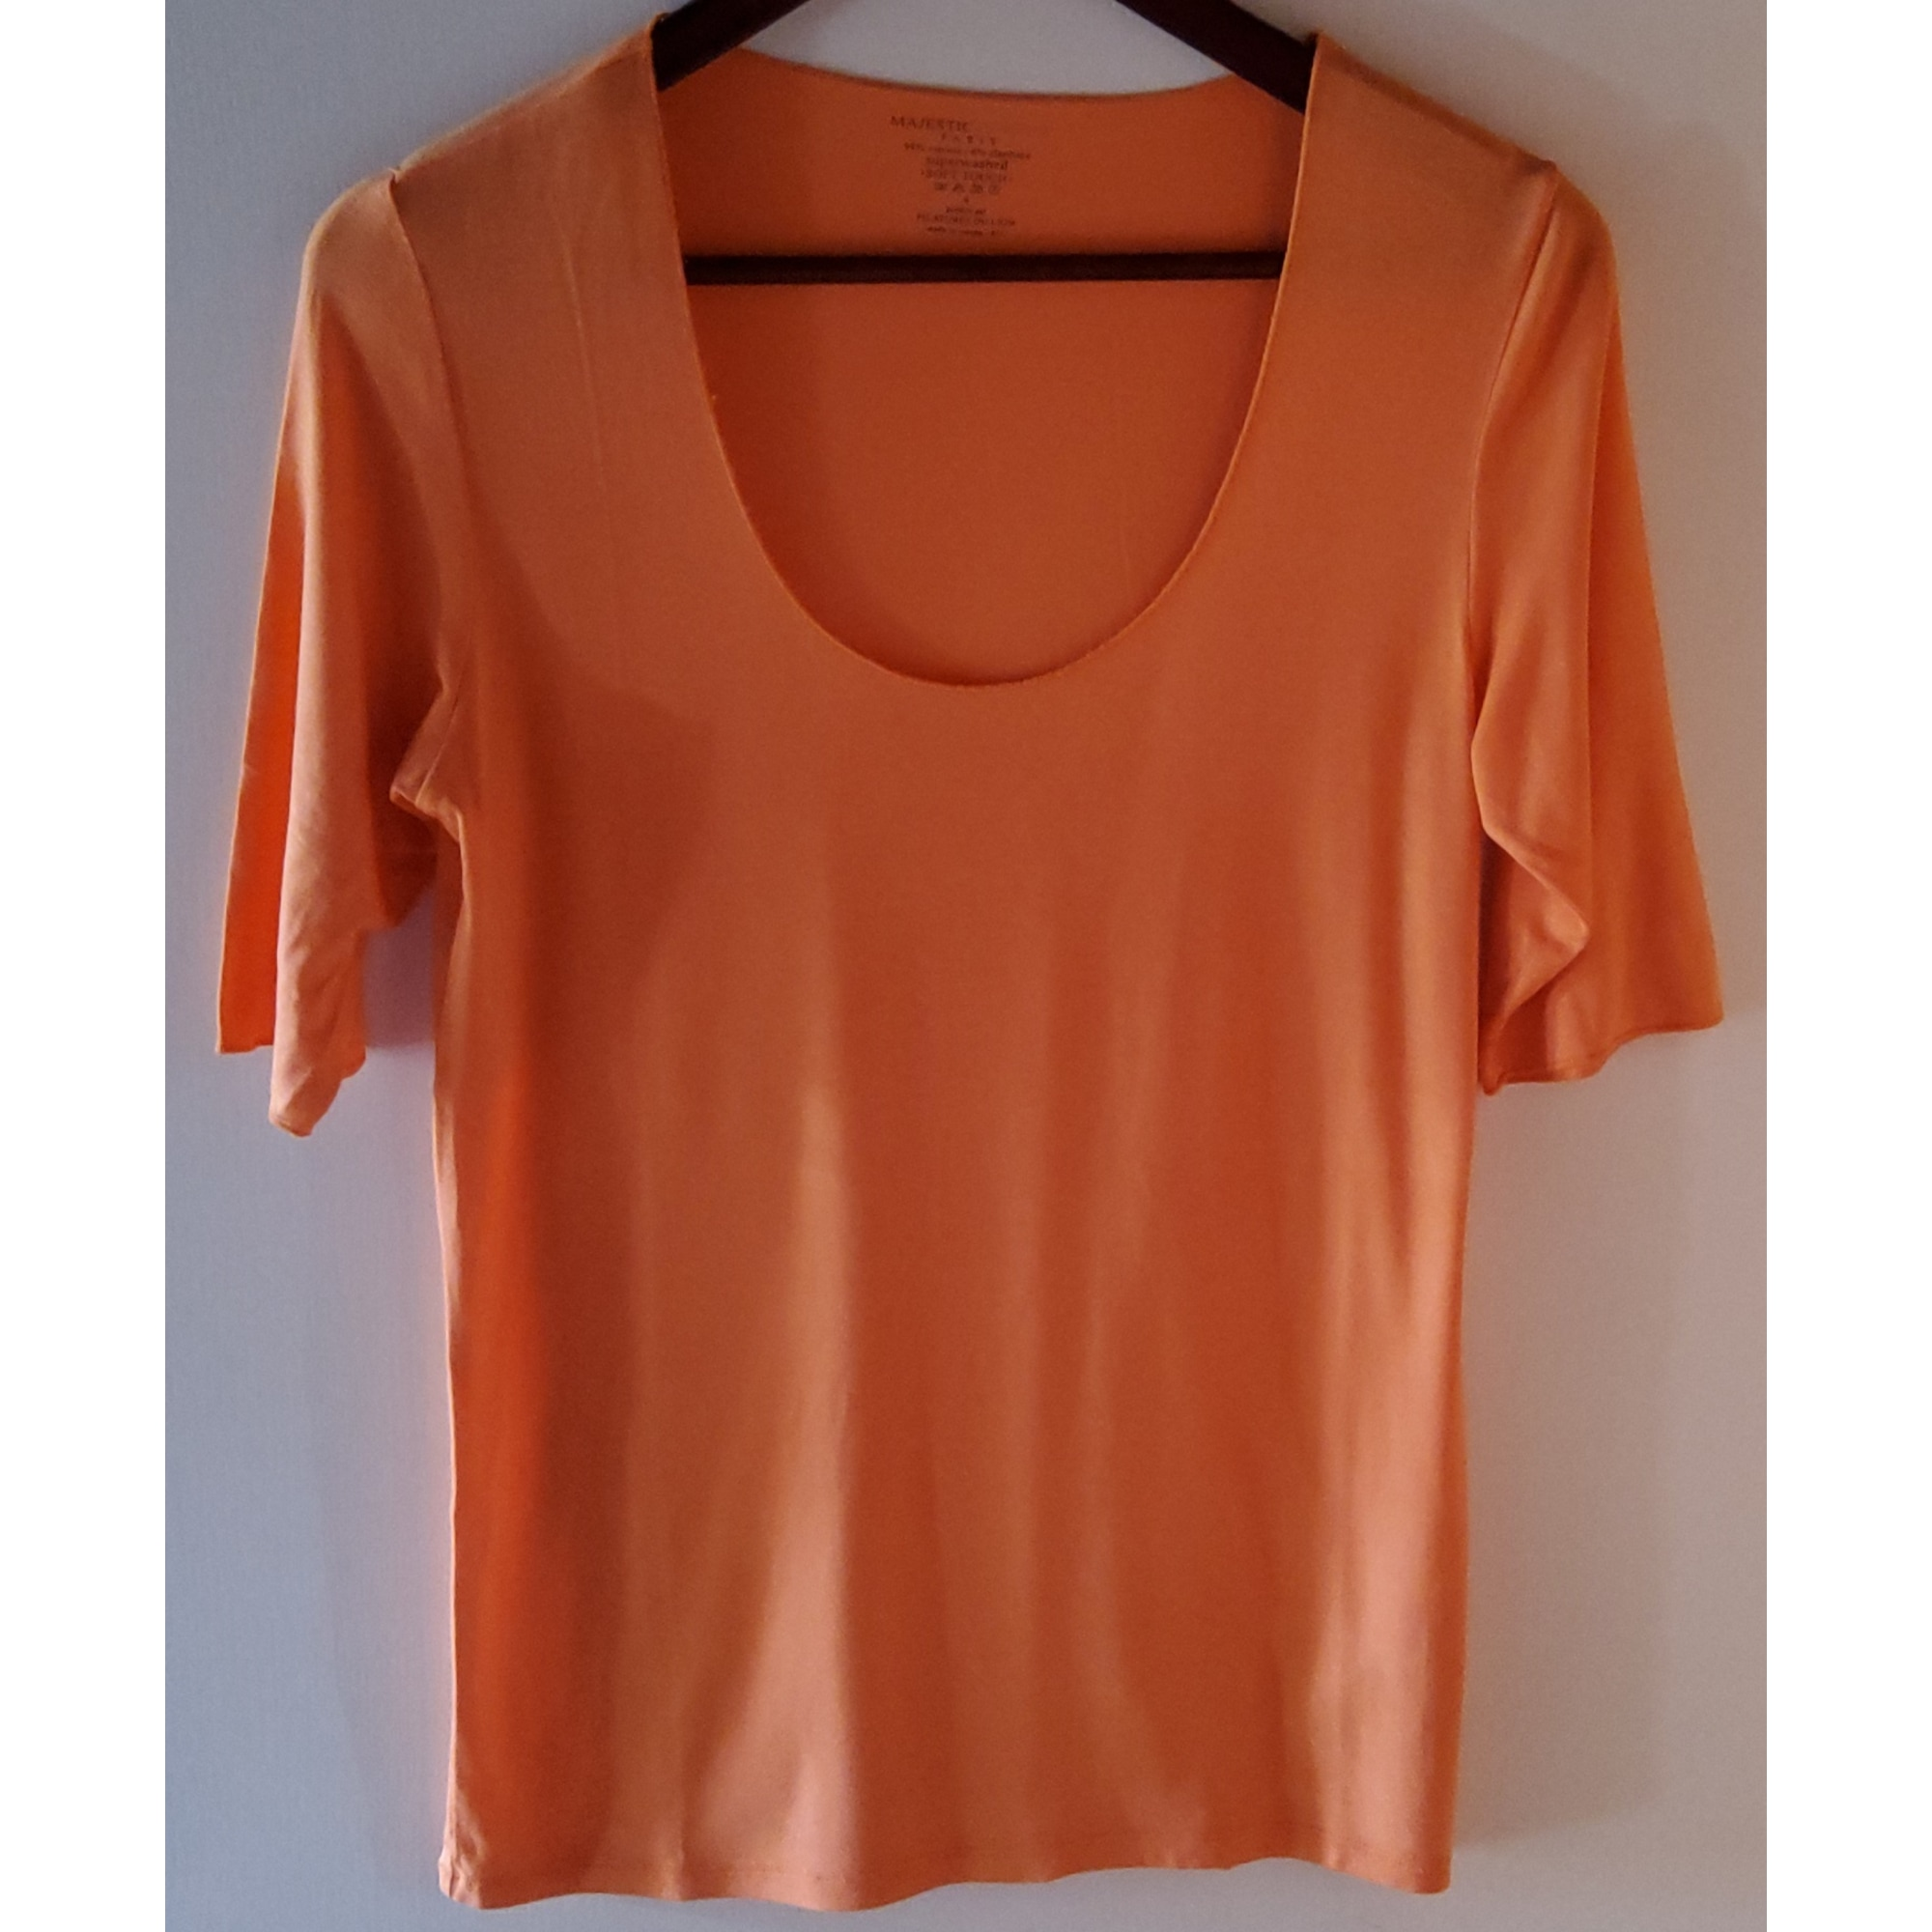 Top, tee-shirt MAJESTIC Orange